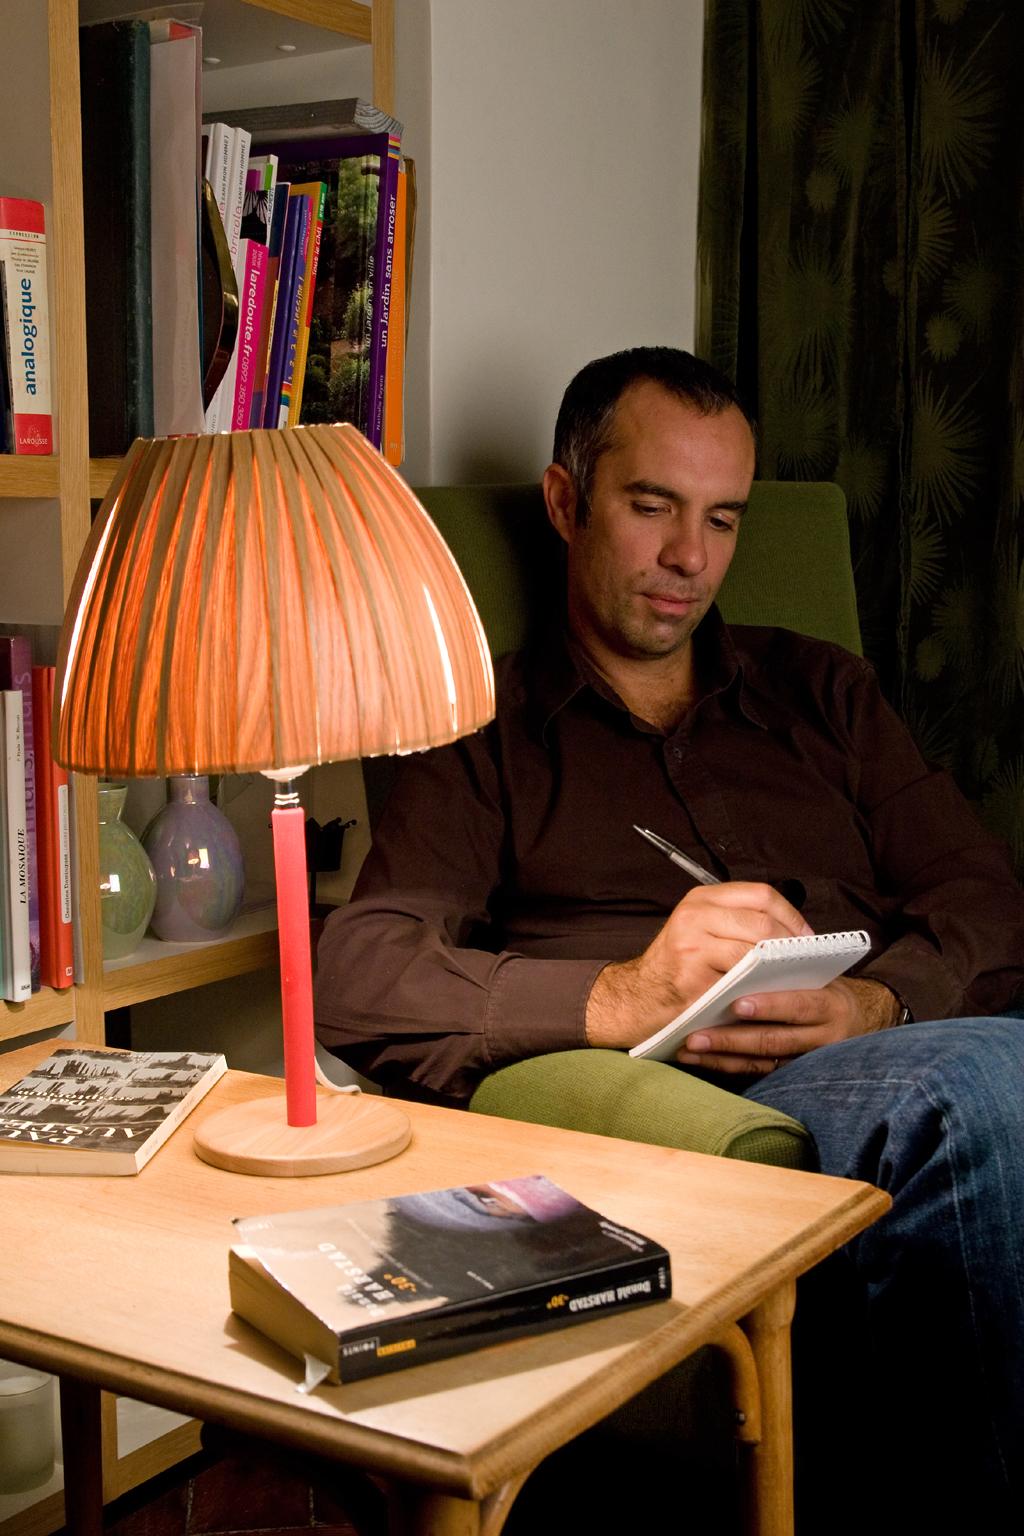 Personnaliser une lampe